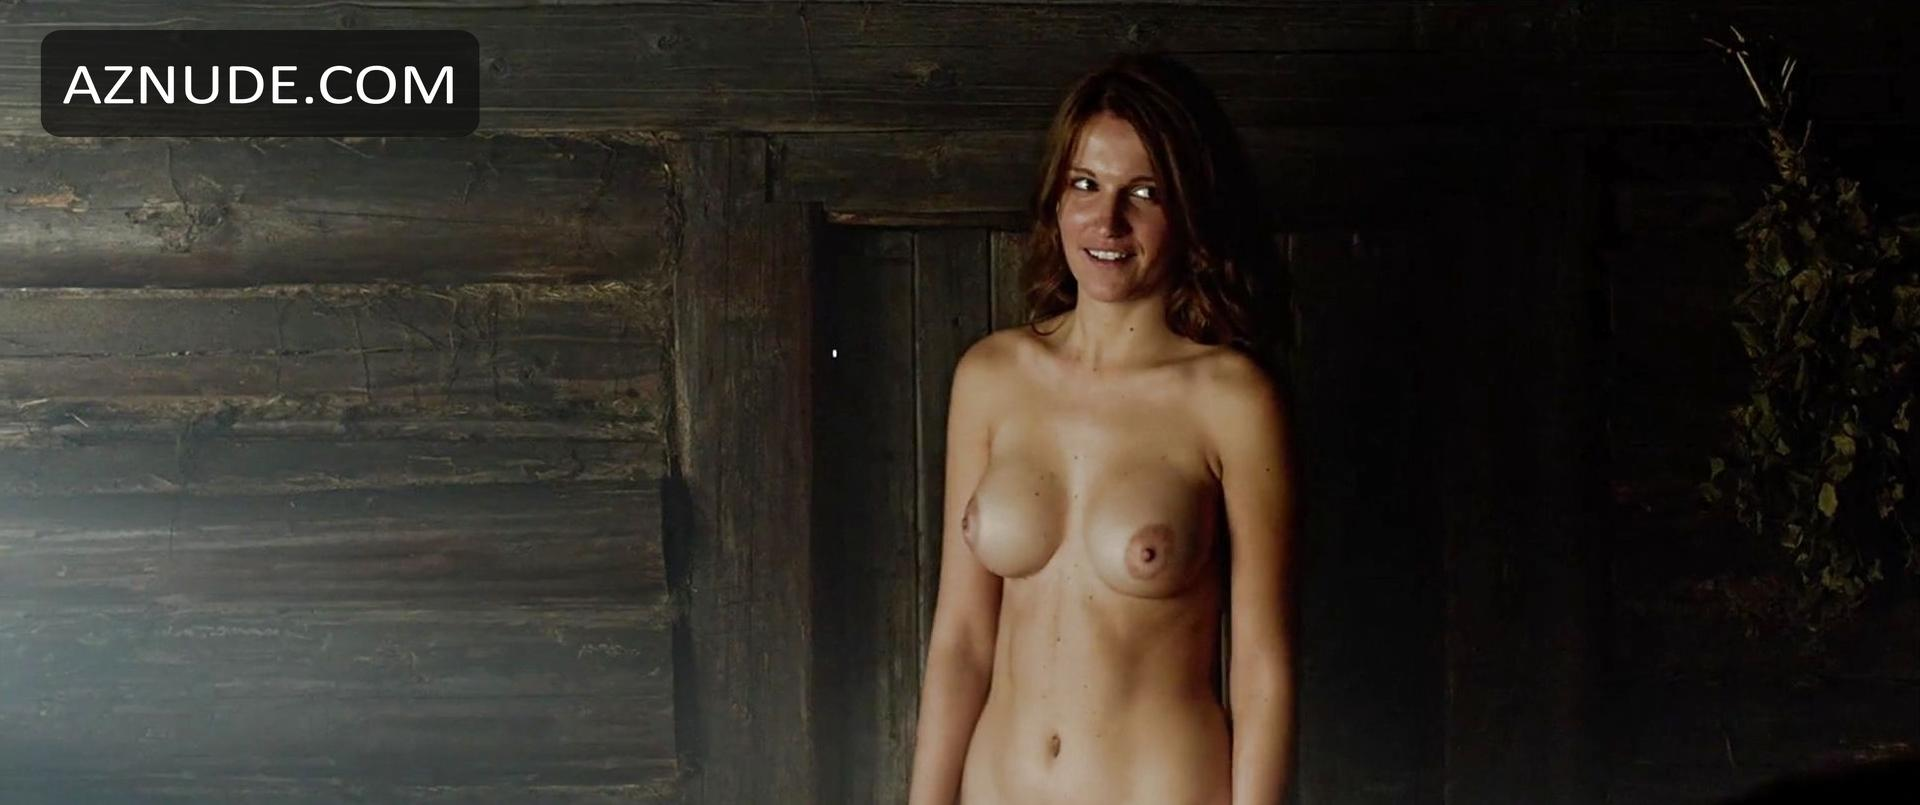 Tits Anastasiya Mikulchina naked (59 photos), Ass, Hot, Feet, lingerie 2015